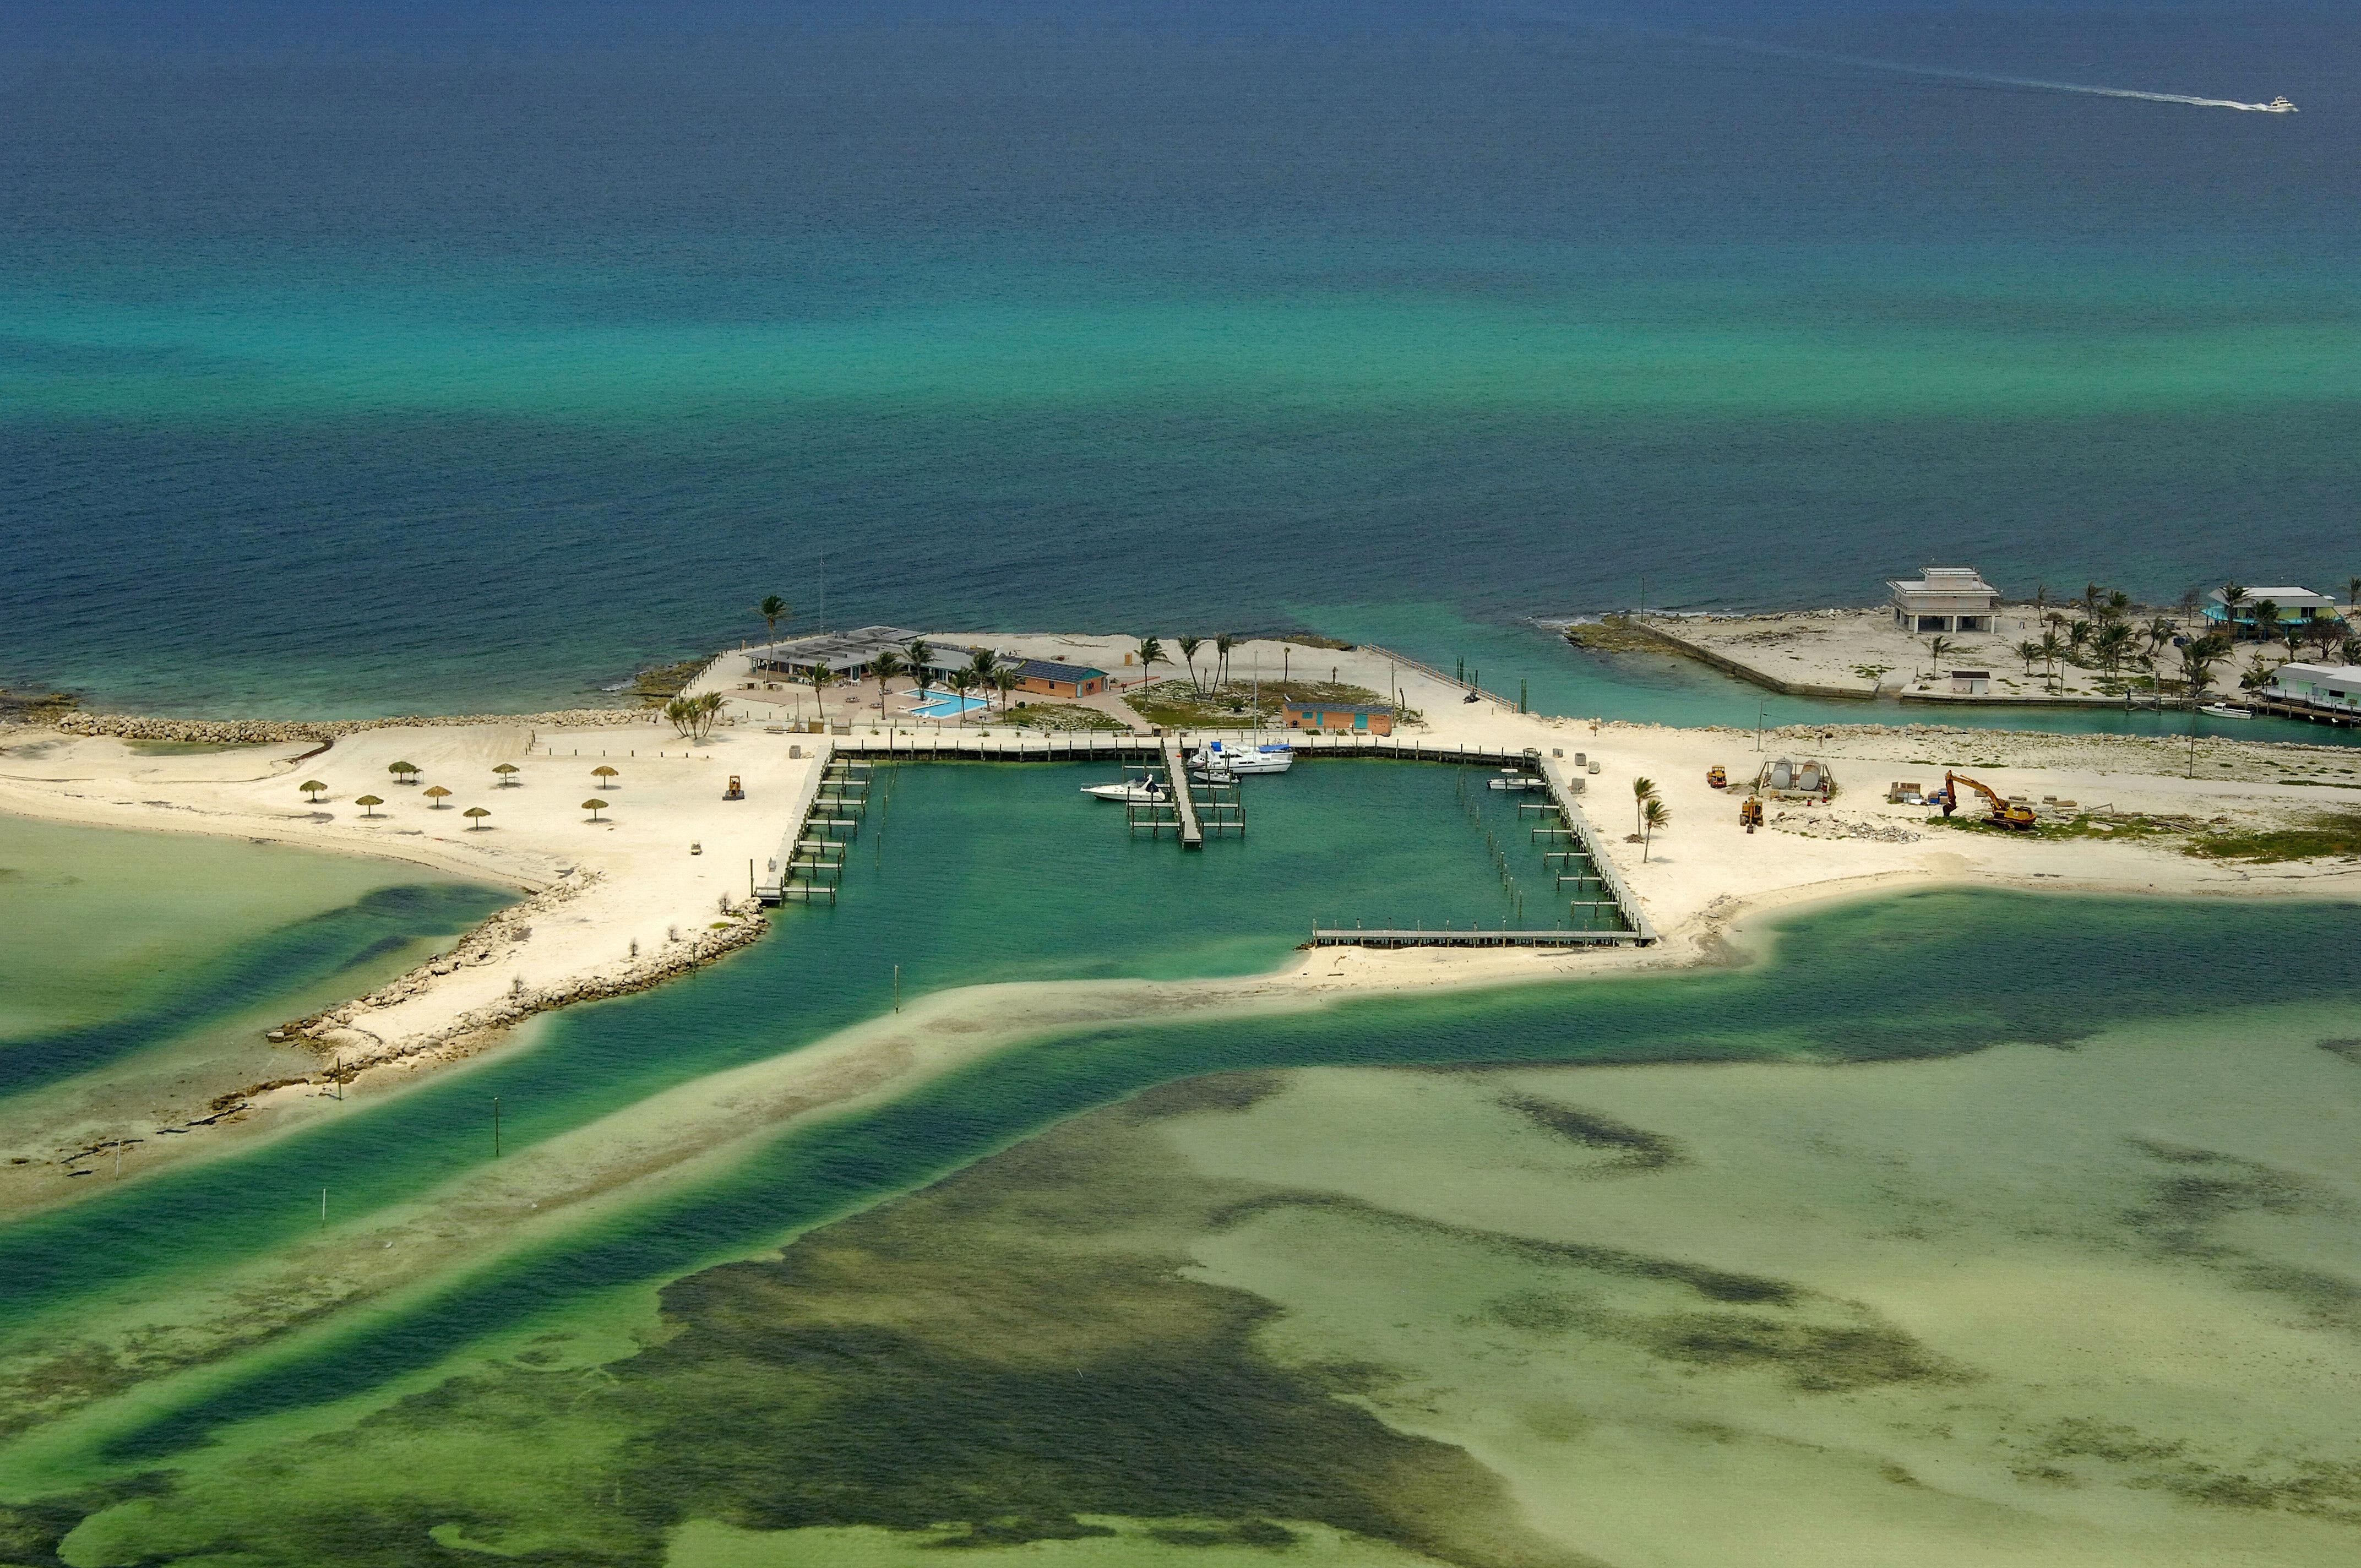 Bimini Beach Club Marina